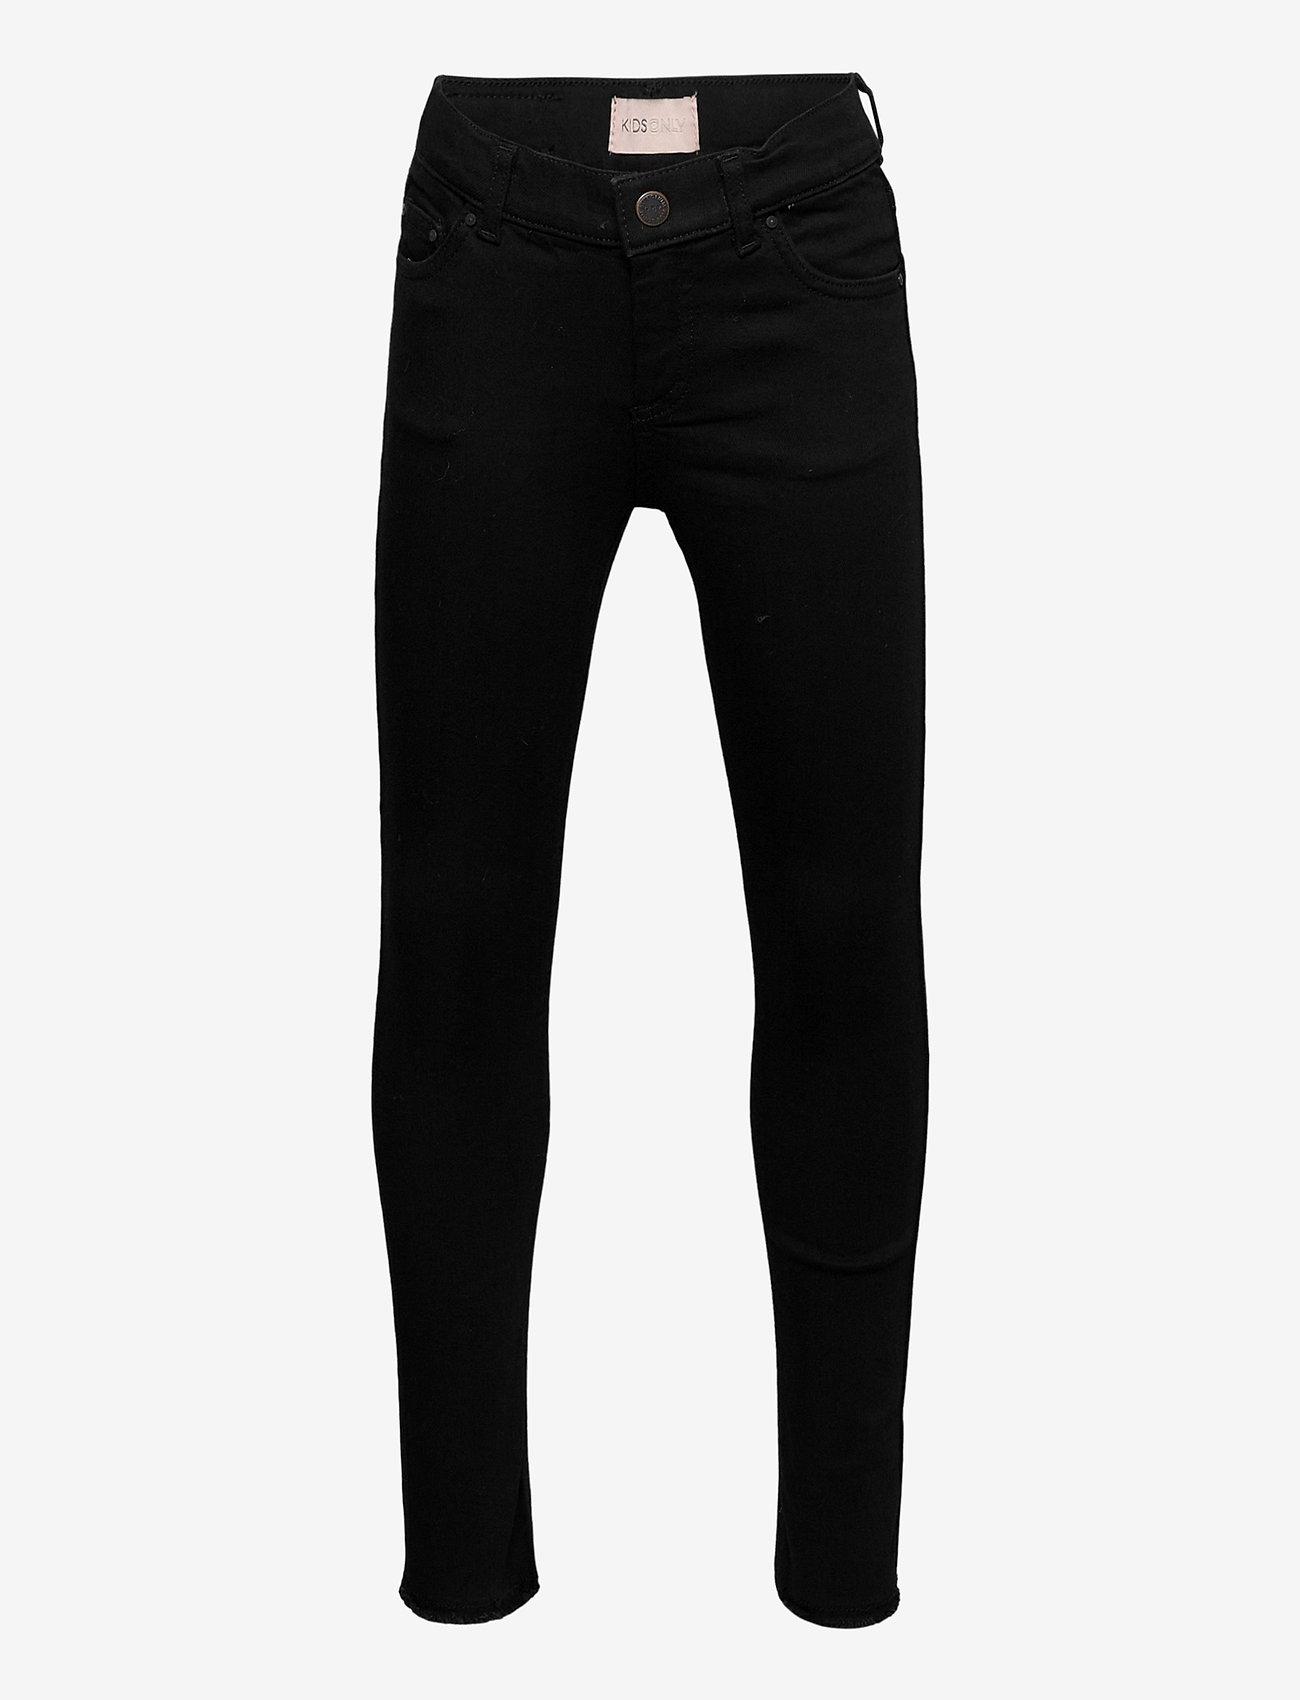 Kids Only - KONBLUSH SKINNY JEANS 2343 - jeans - black denim - 0